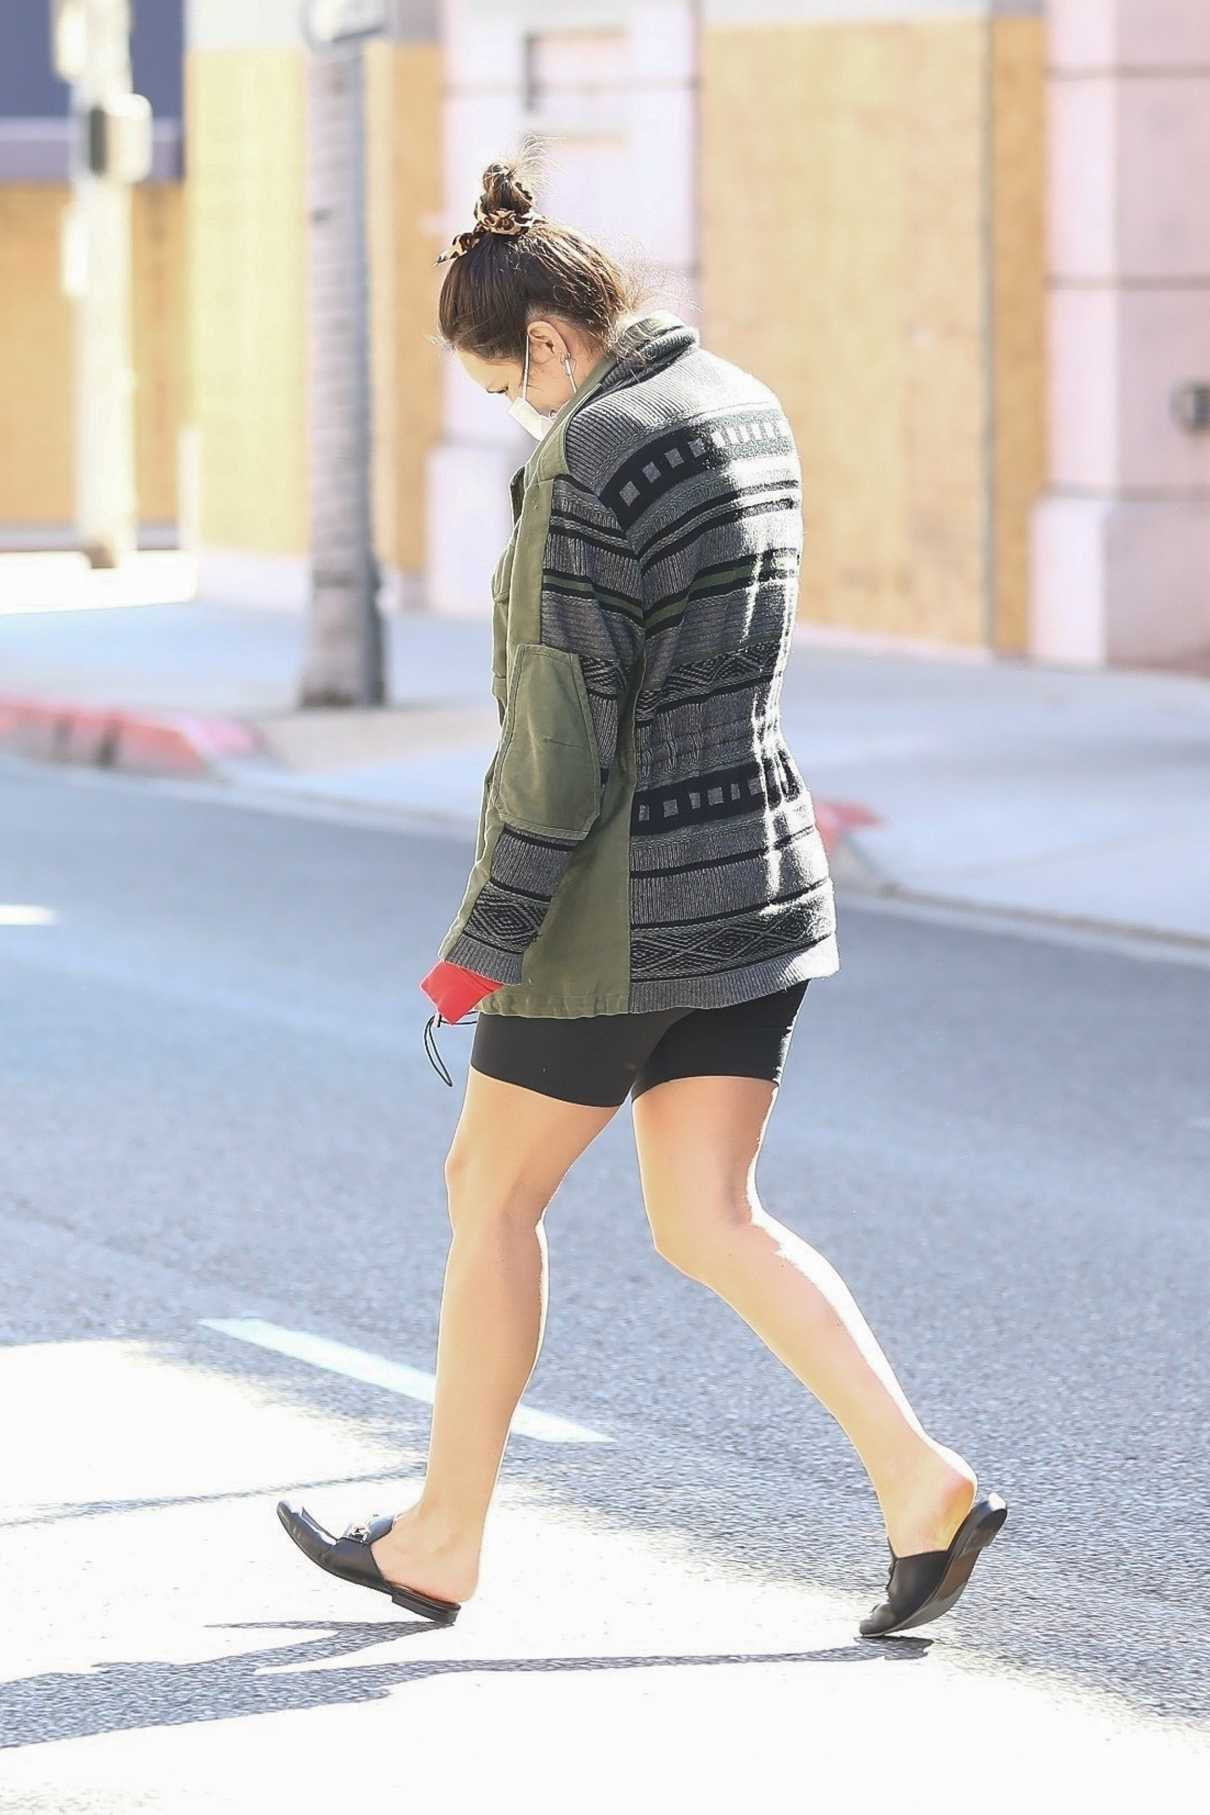 Katharine McPhee in a Black Spandex Shorts